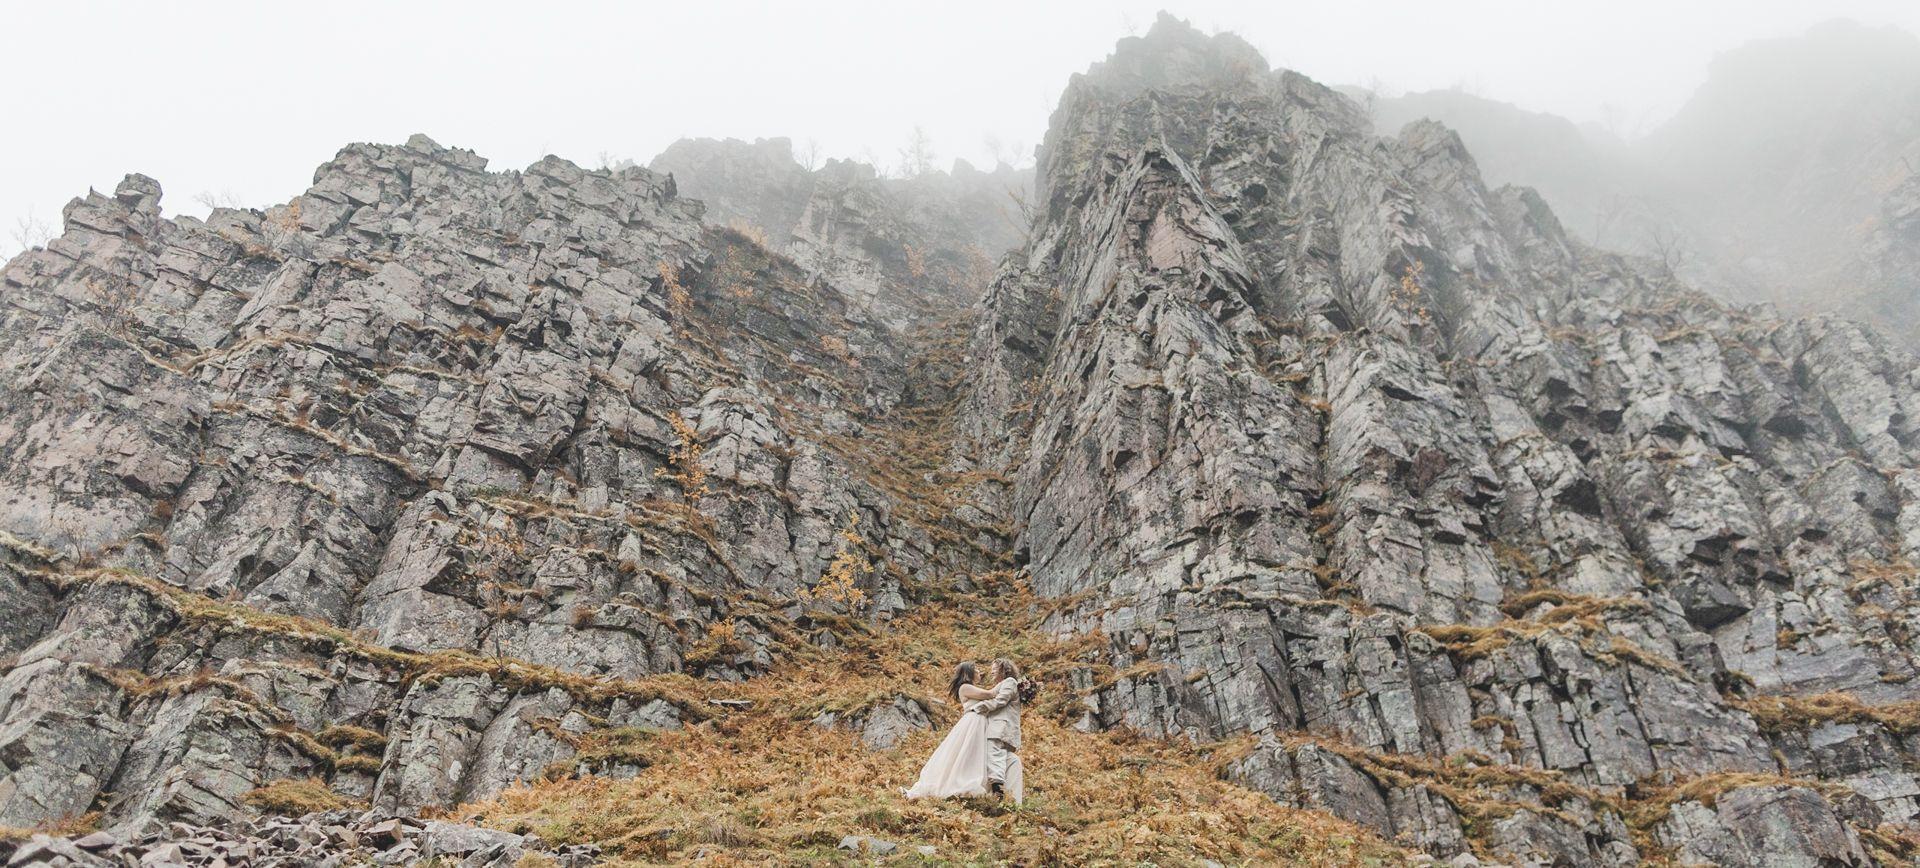 glamping elopment in sweden - elope to fulufjället national park